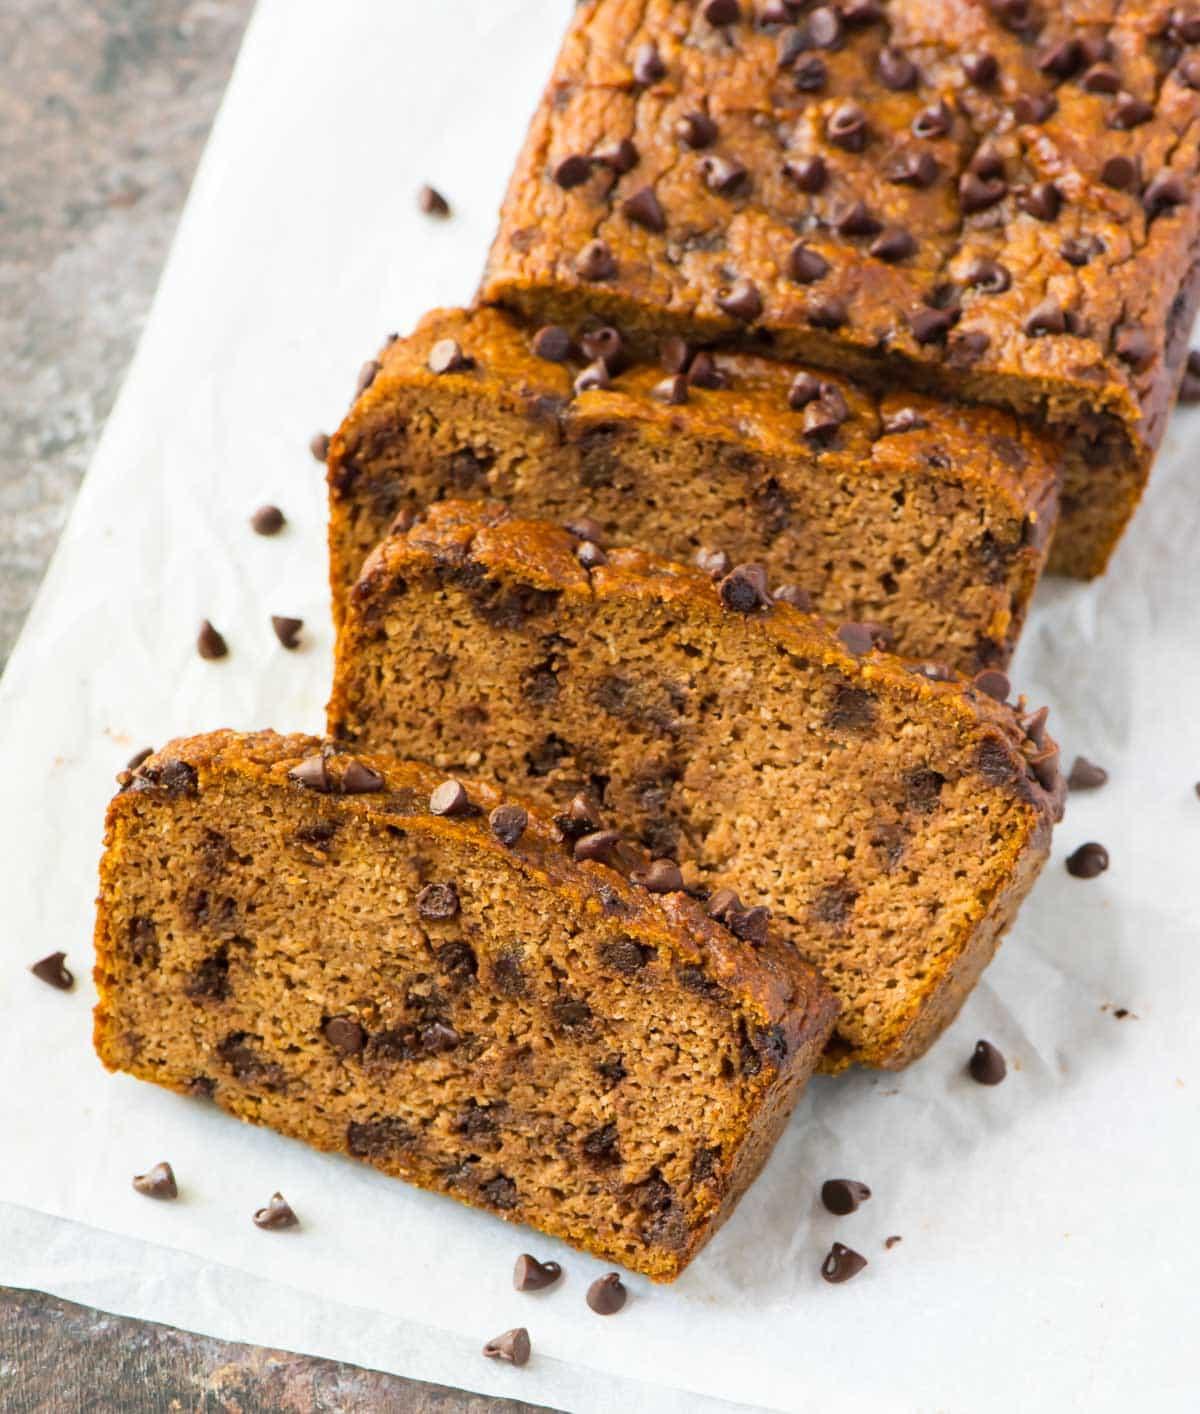 Moist Paleo Pumpkin Bread recipe. Easy, gluten free, and healthy